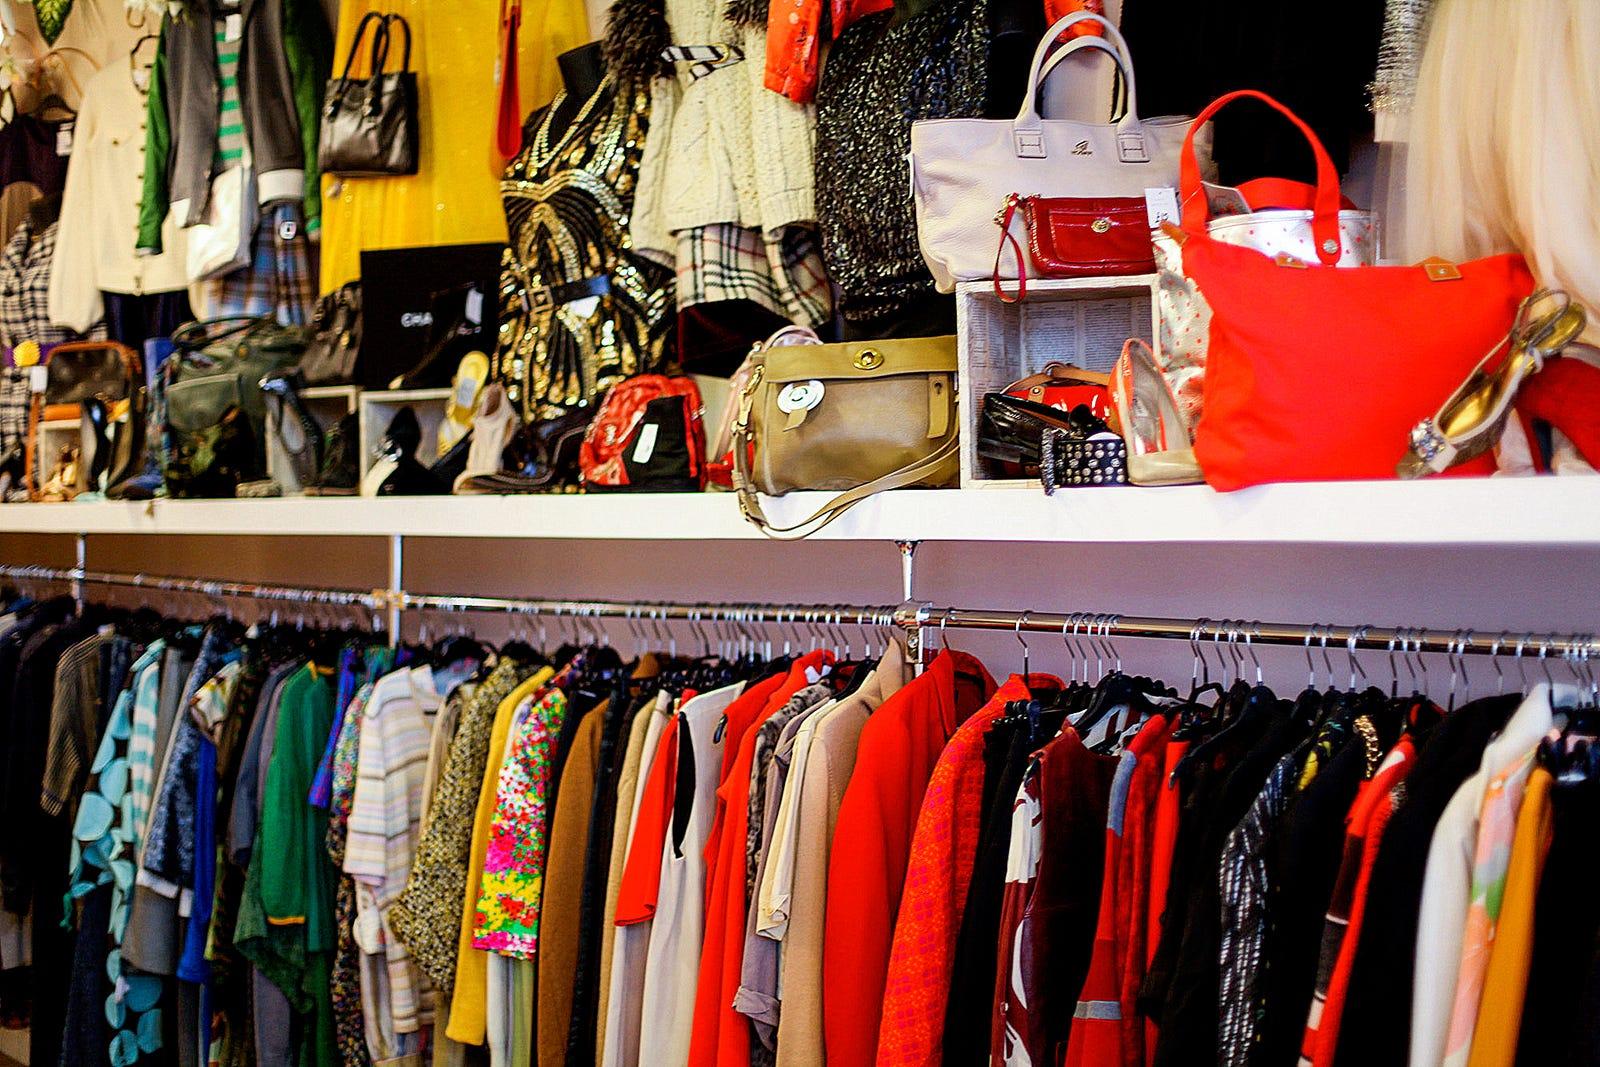 London Designer Consignment Stories   handbags  shoes. Furniture Stores London Ontario Area. Home Design Ideas